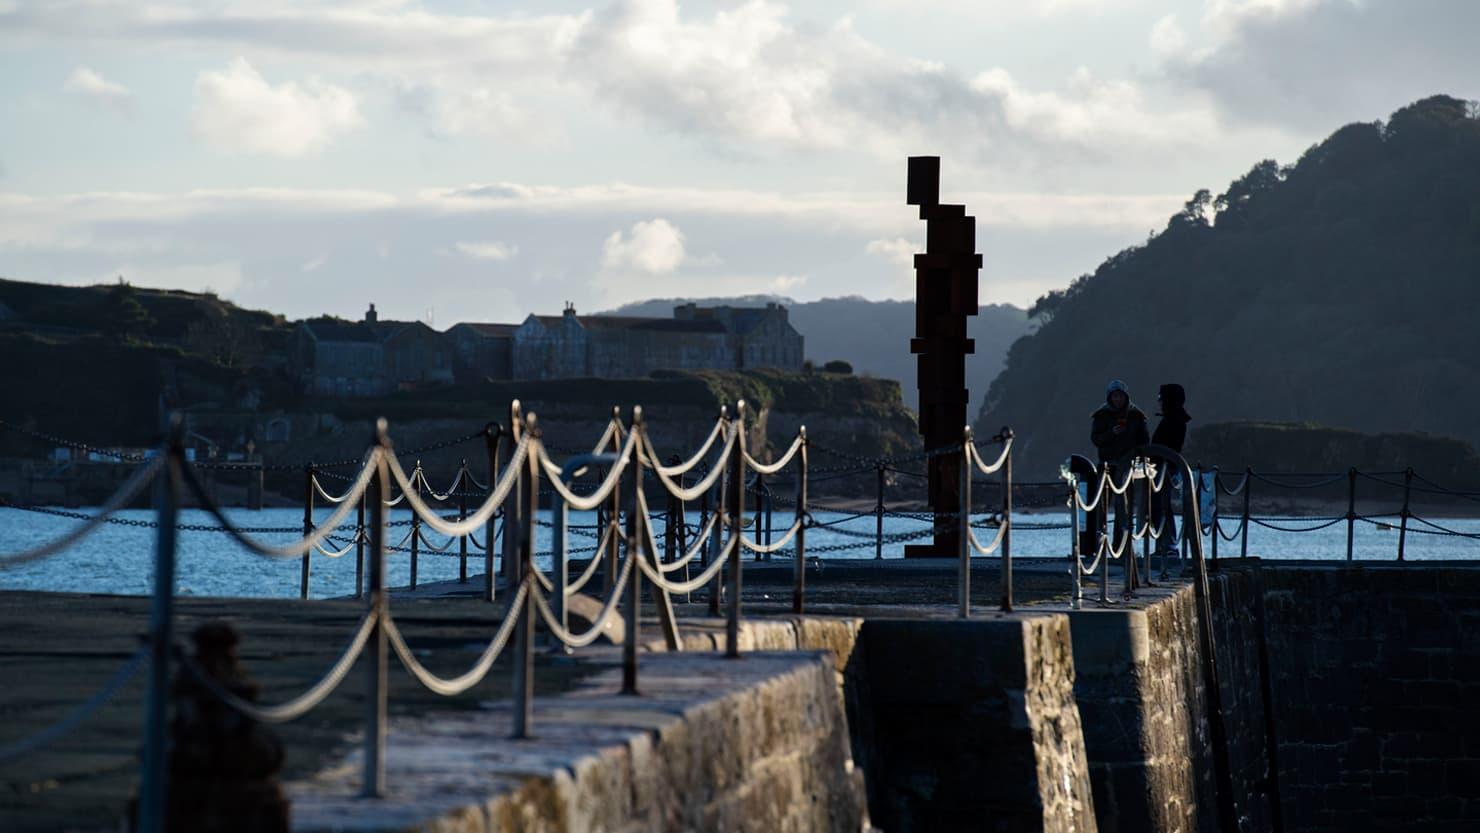 LOOK II by Antony Gormley on West Hoe Pier, October 2020